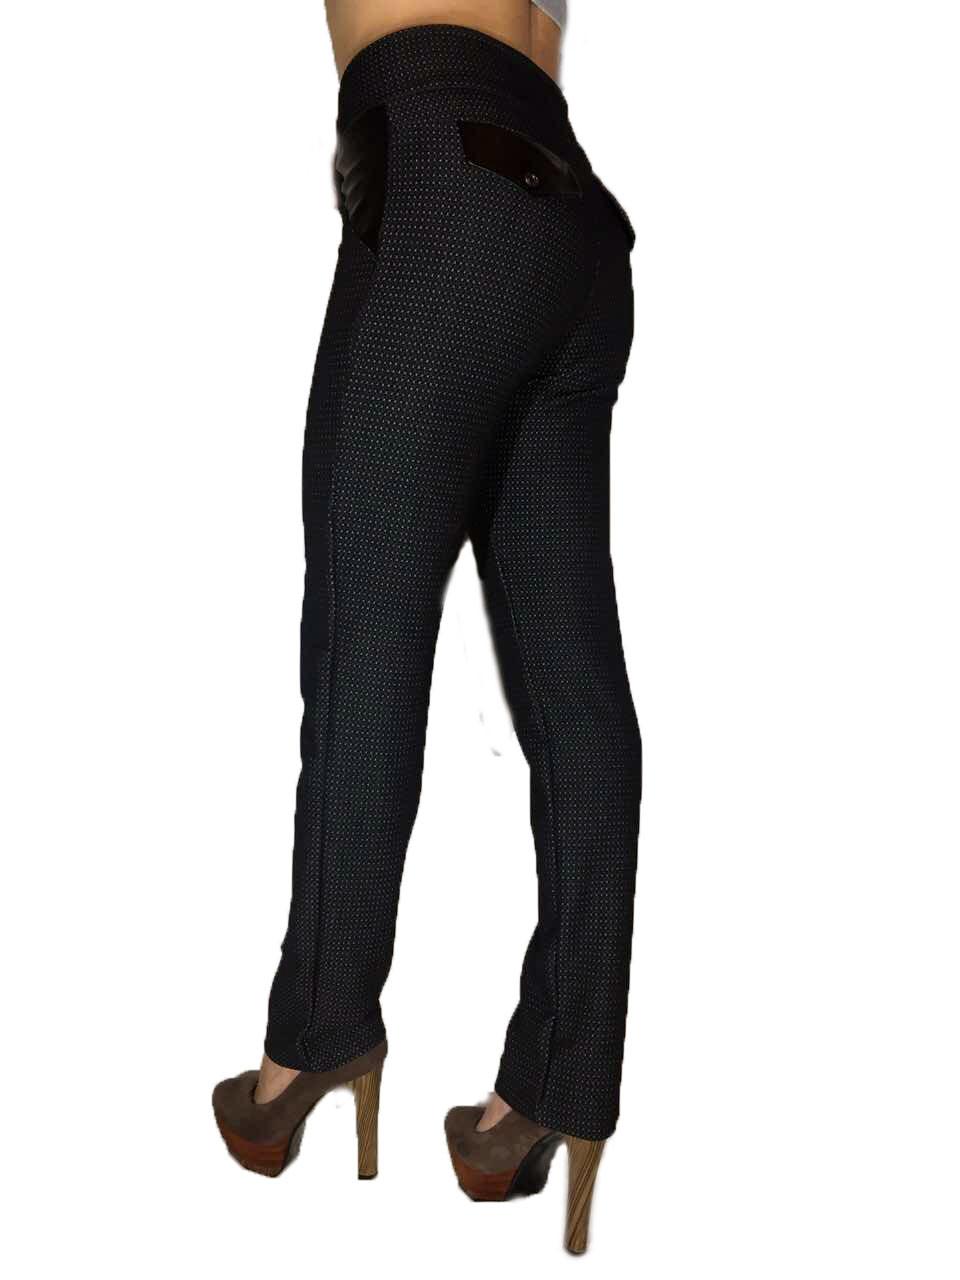 Женские классические брюки жаккард черные